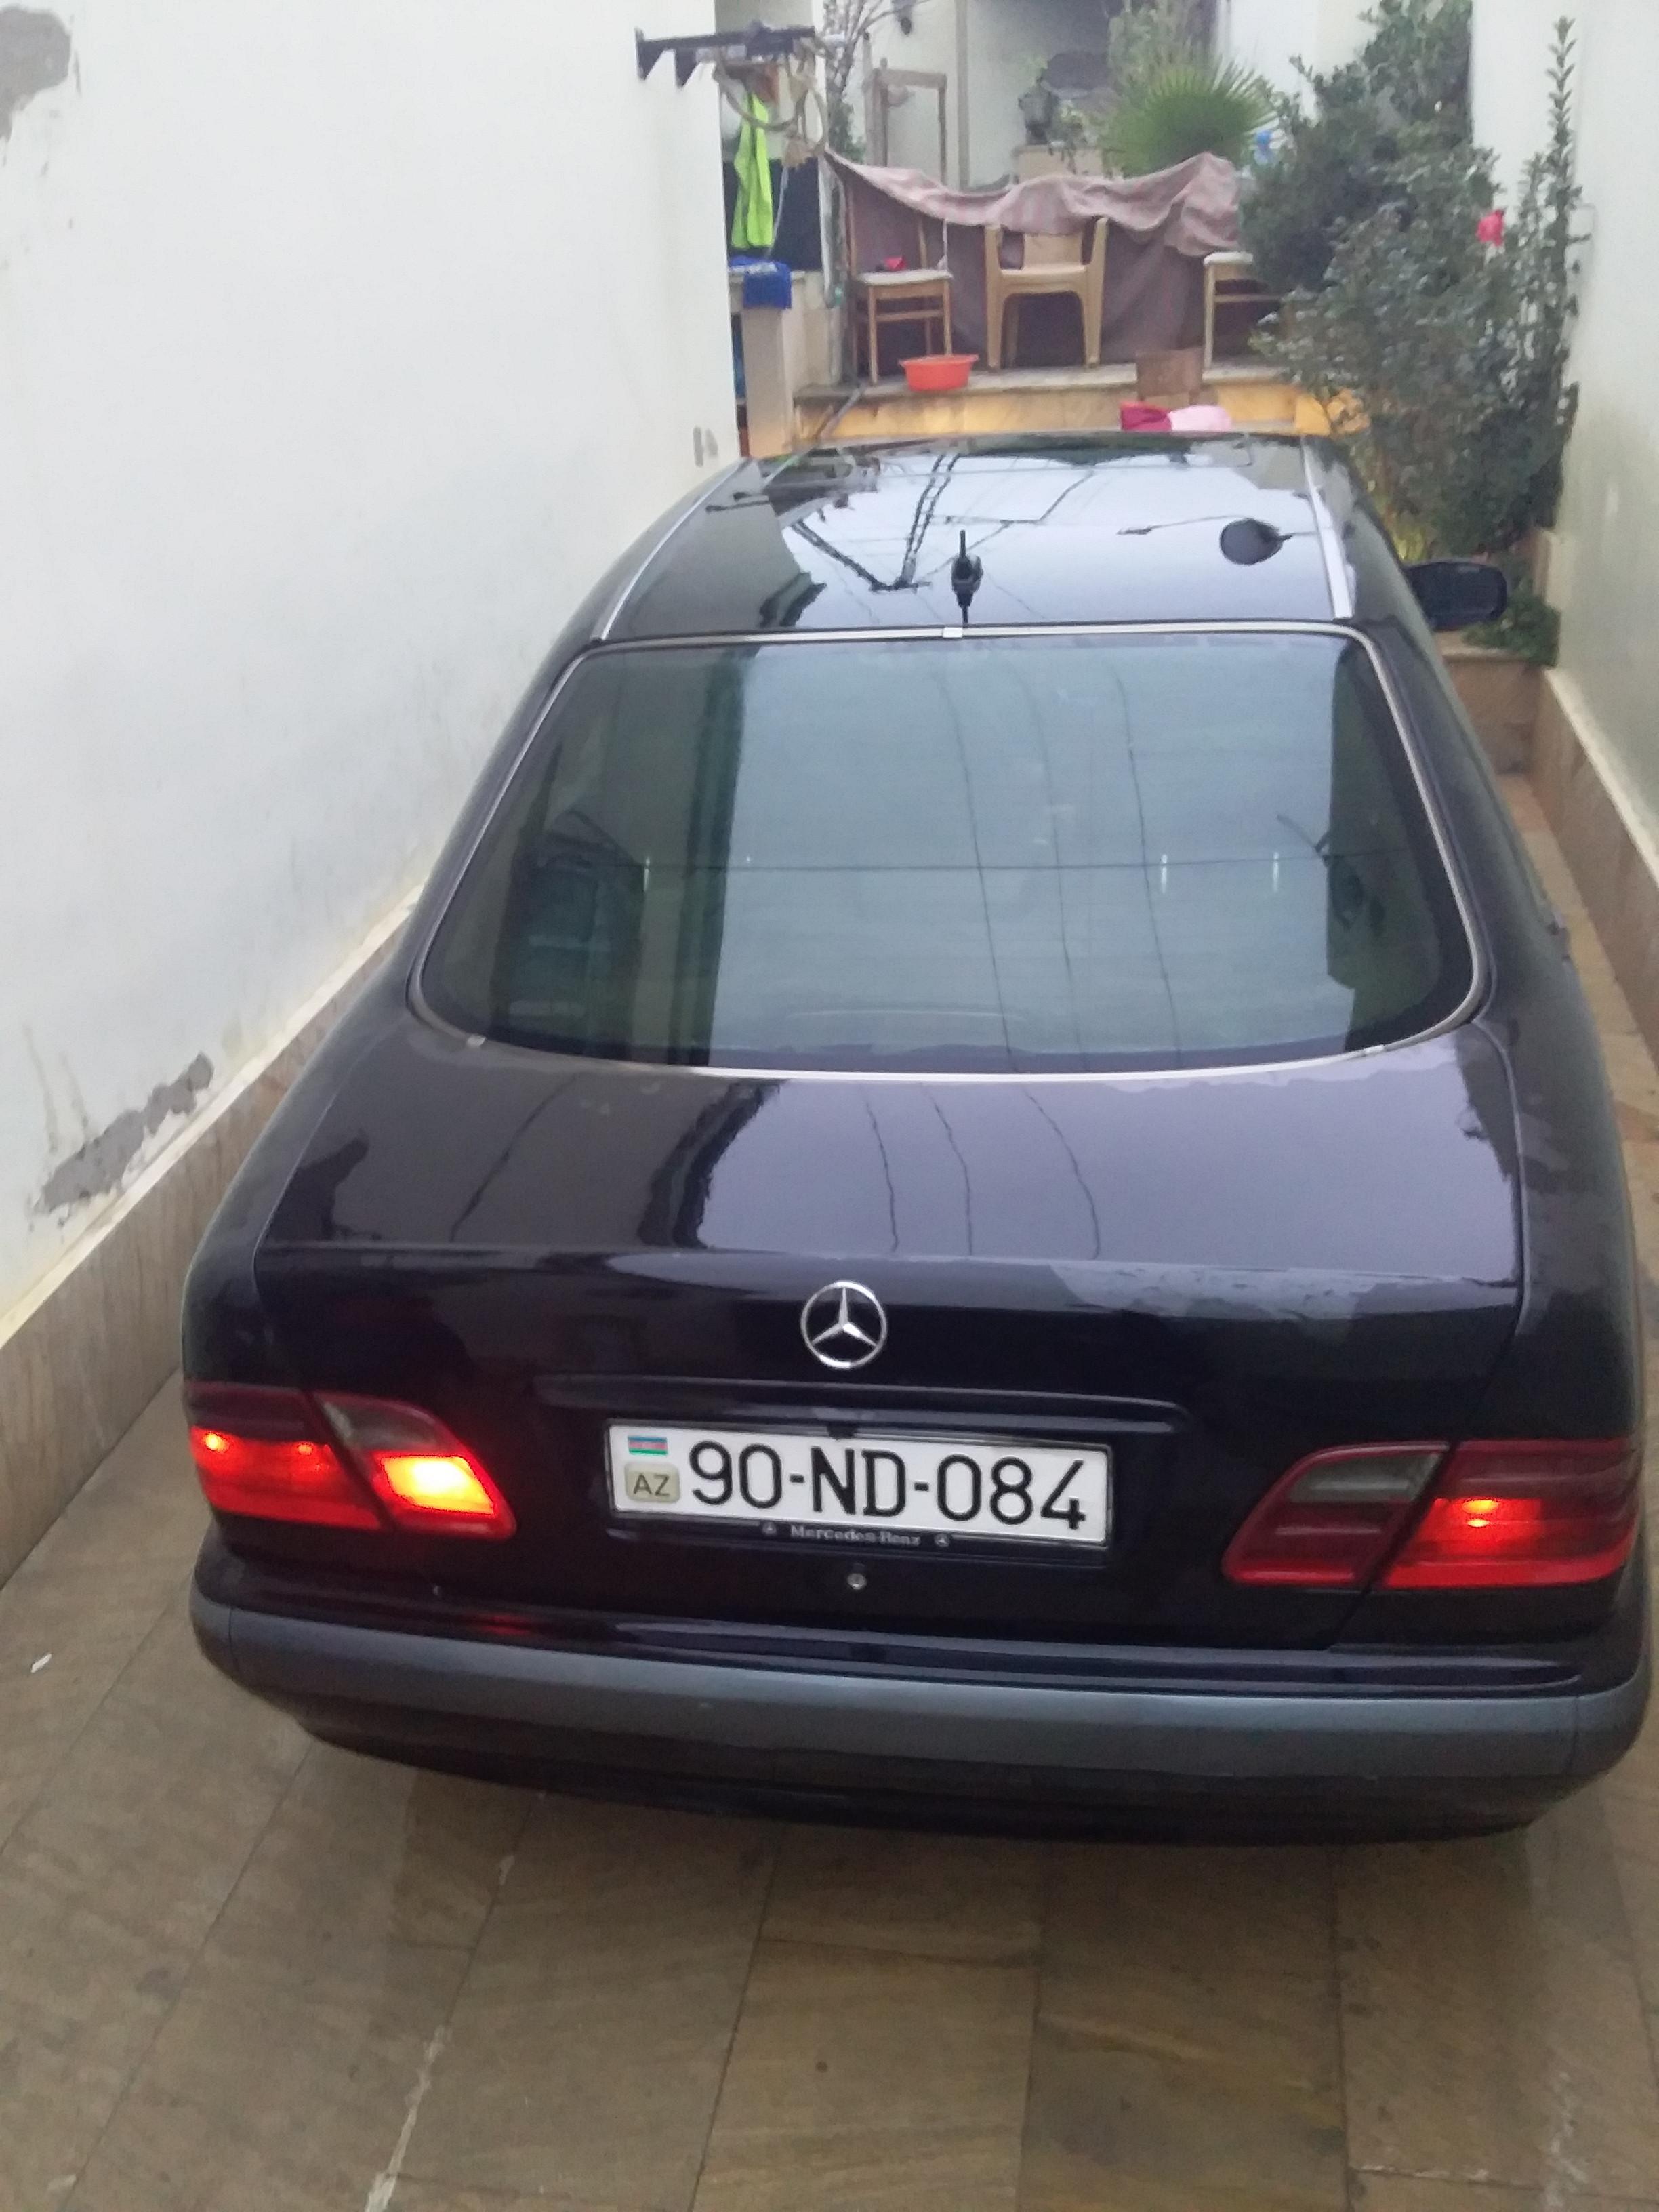 Mercedes-Benz E 220 2.2(lt) 2001 İkinci əl  $15000